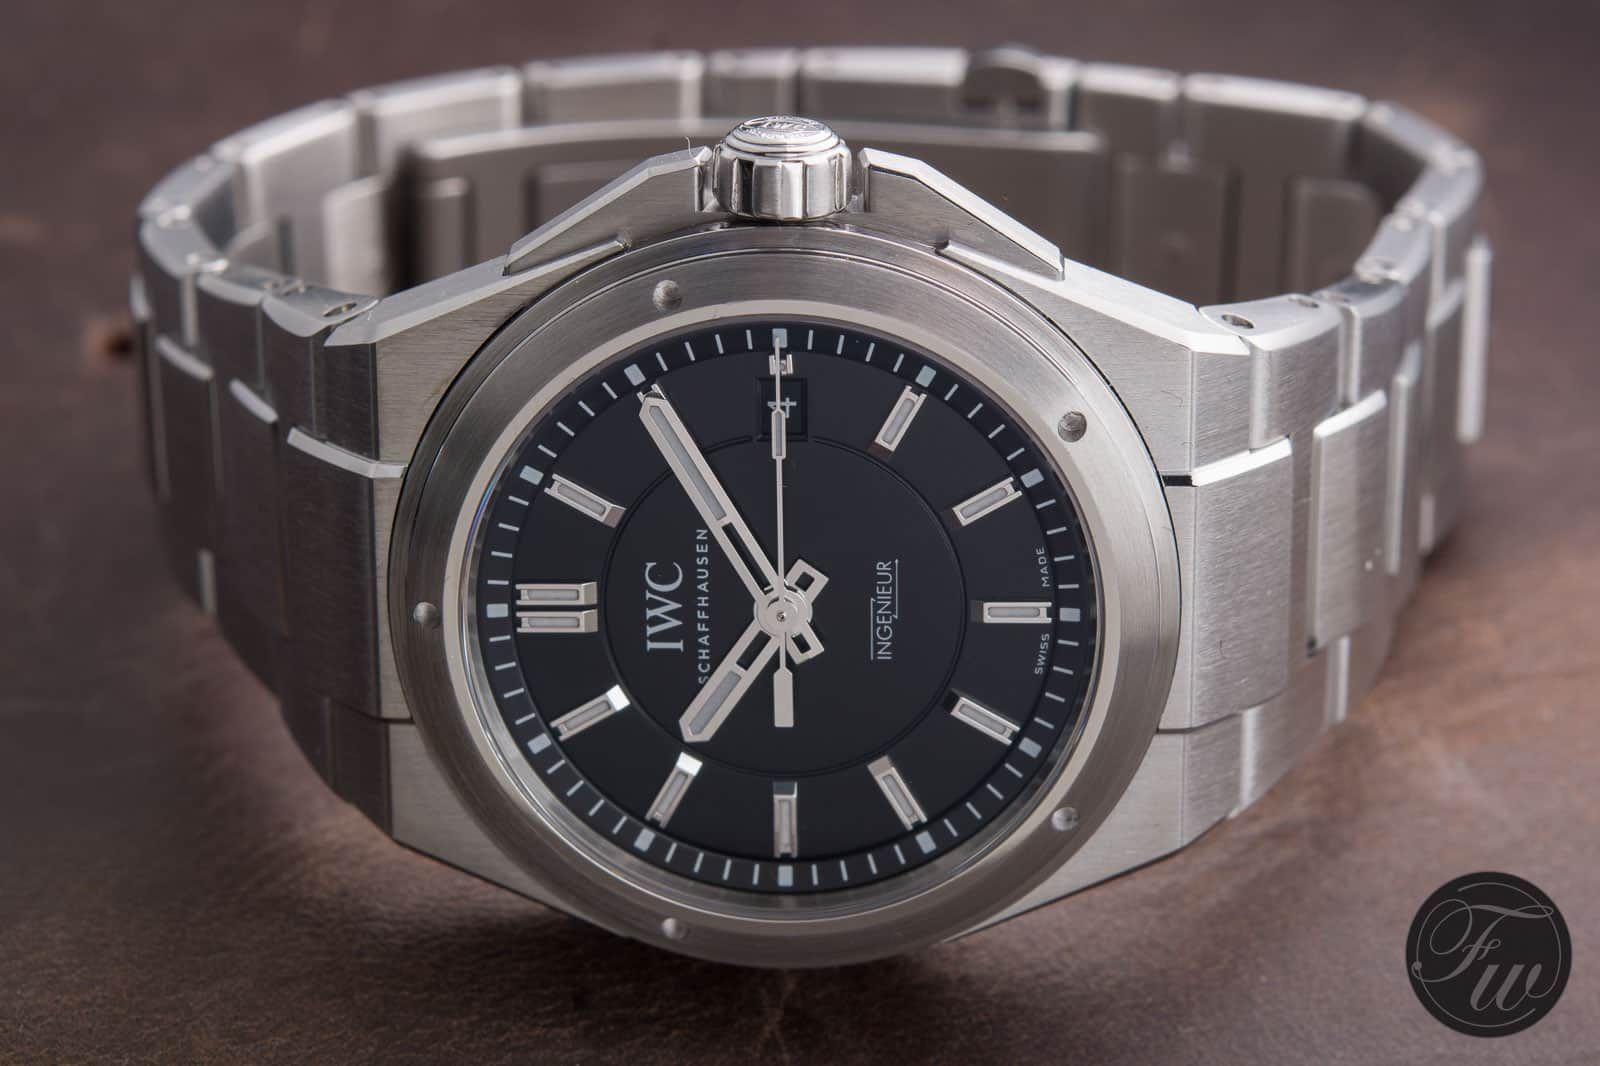 IWC Ingenieur 3239 Iwc, Iwc watches, Rolex milgauss